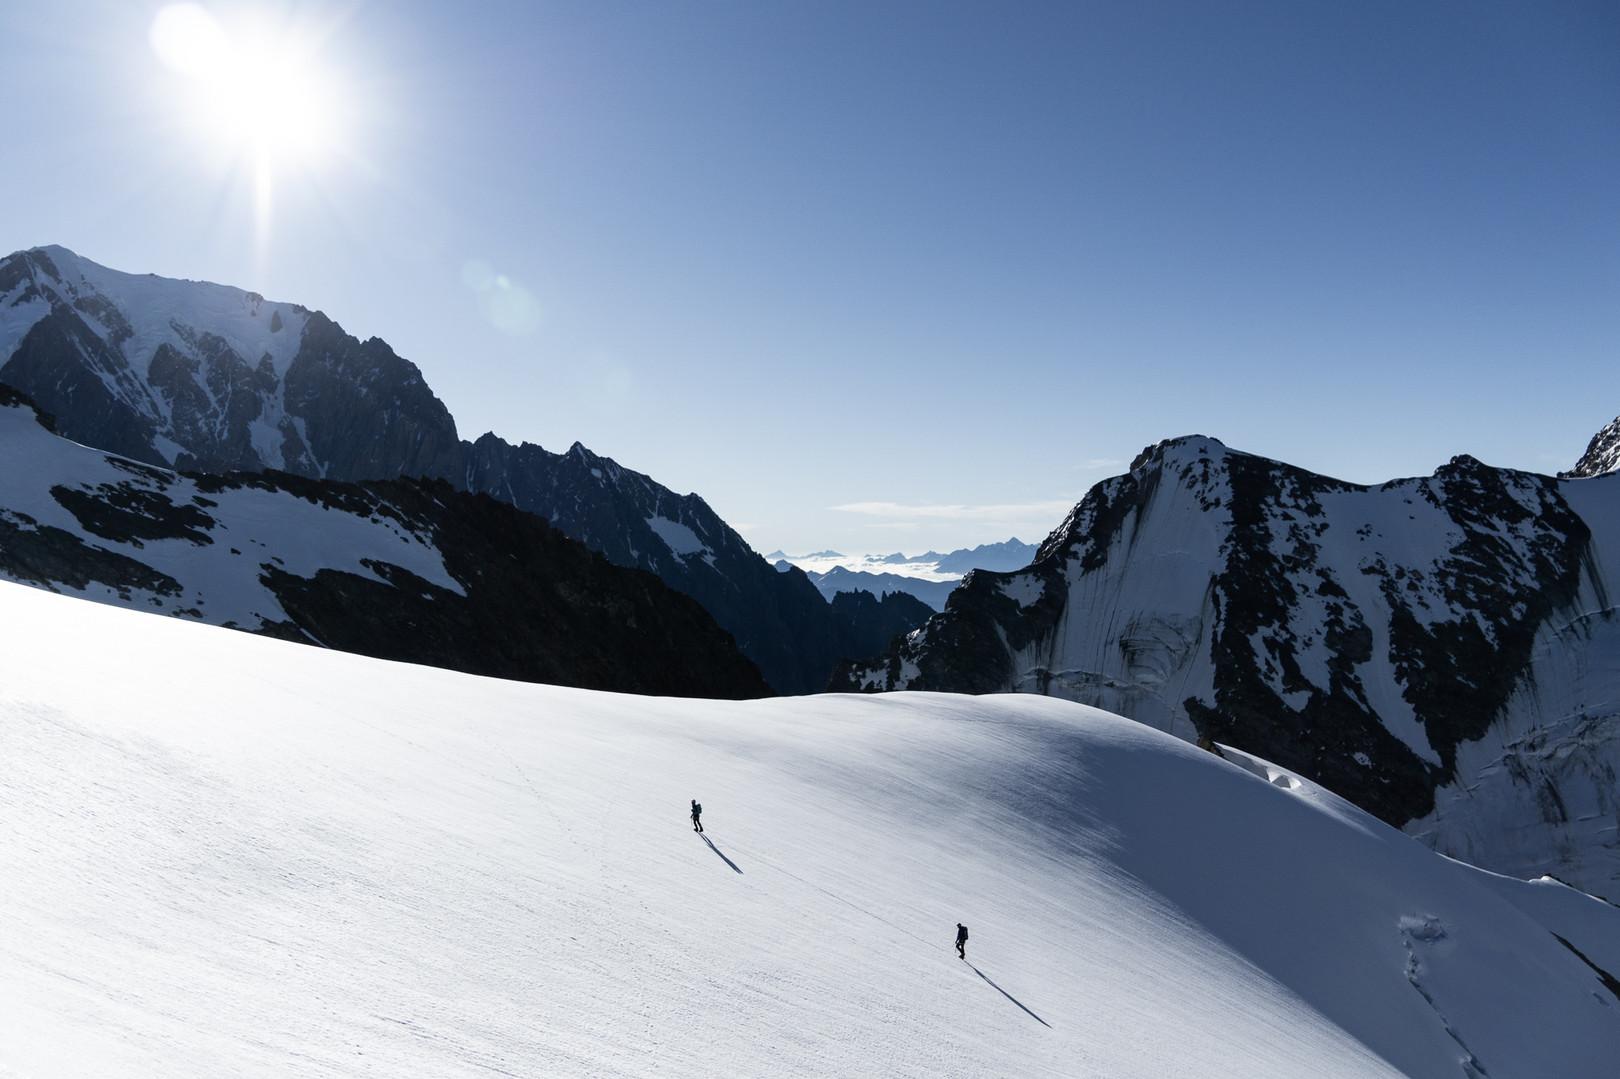 Alpinists starting the famous Dômes de Miage traverse